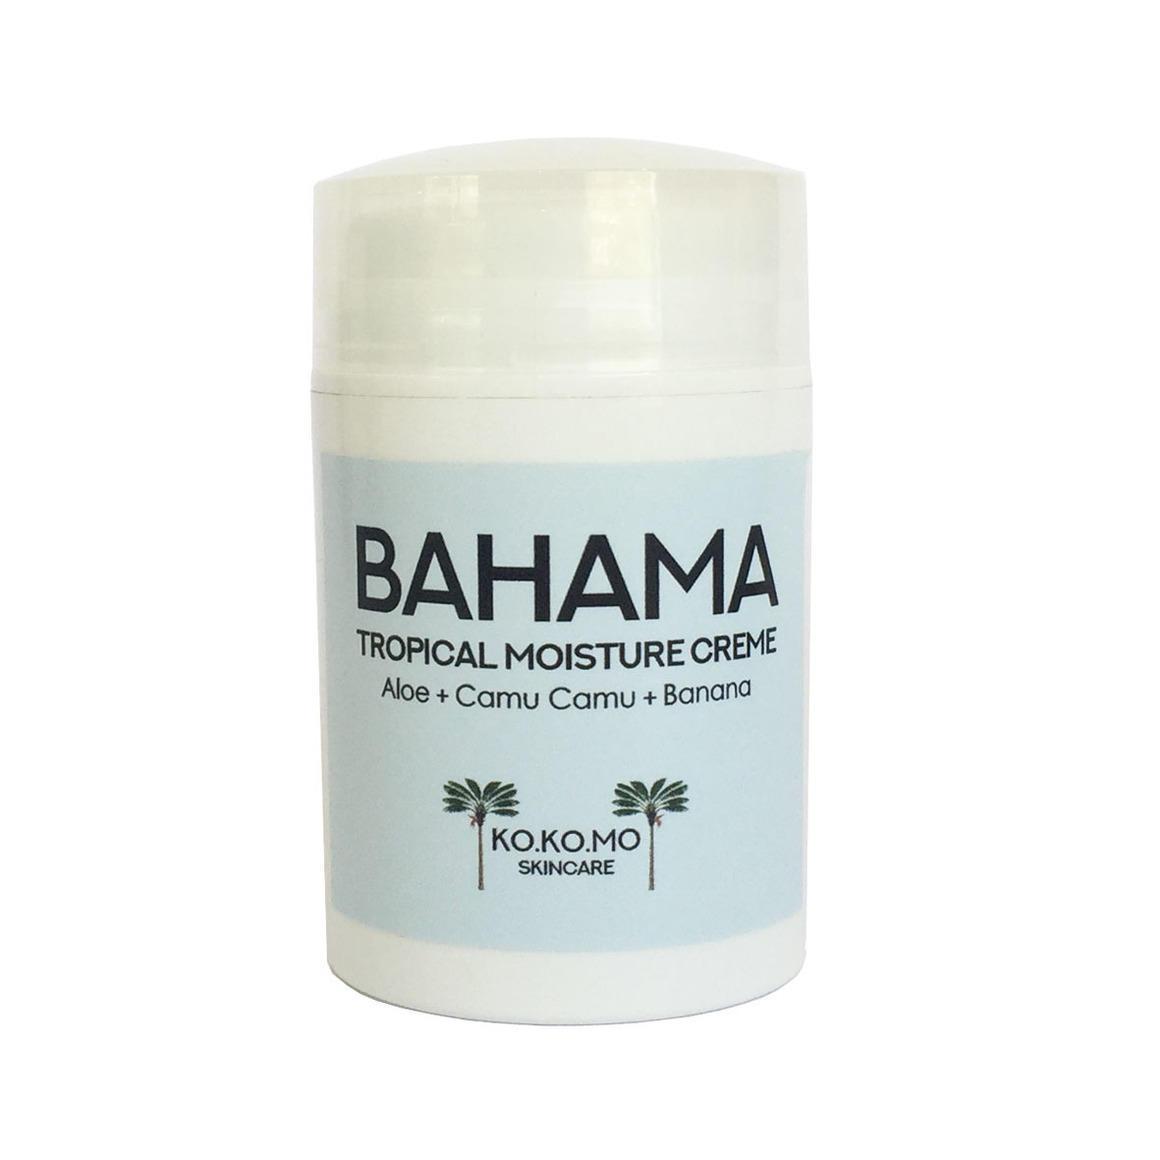 Bahama Tropical Moisture Creme   Trada Marketplace